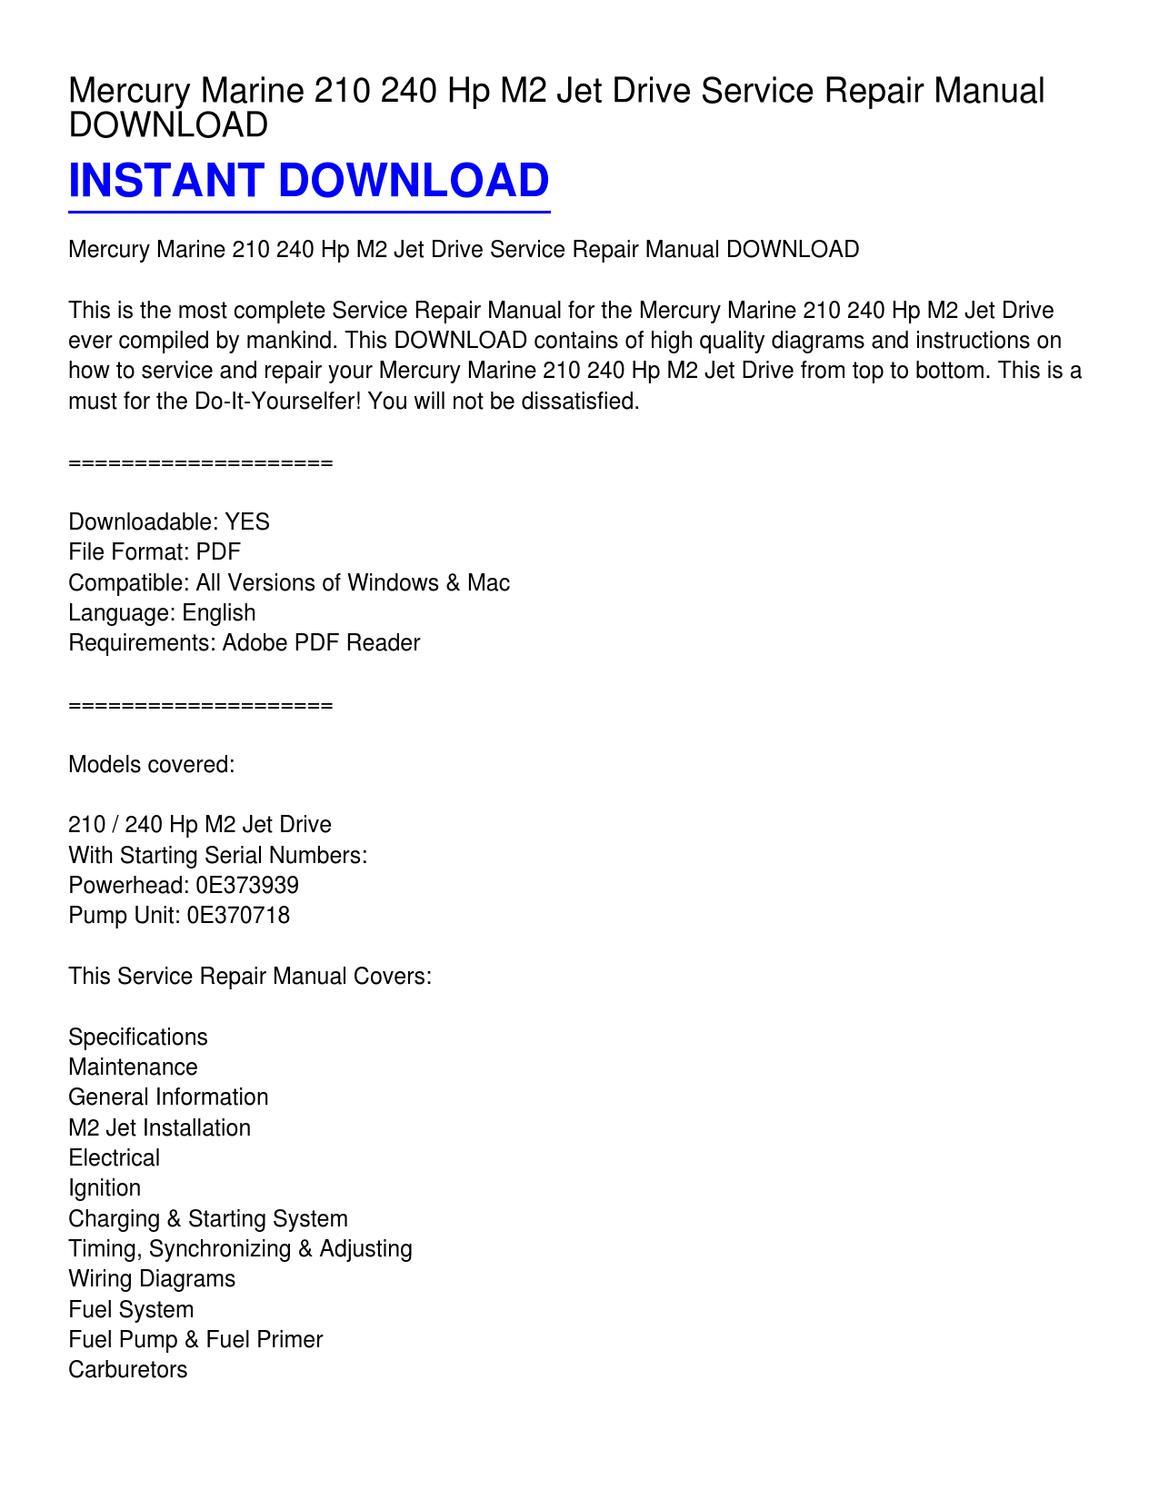 mercury marine 210 240 hp m2 jet drive service repair manual rh issuu com